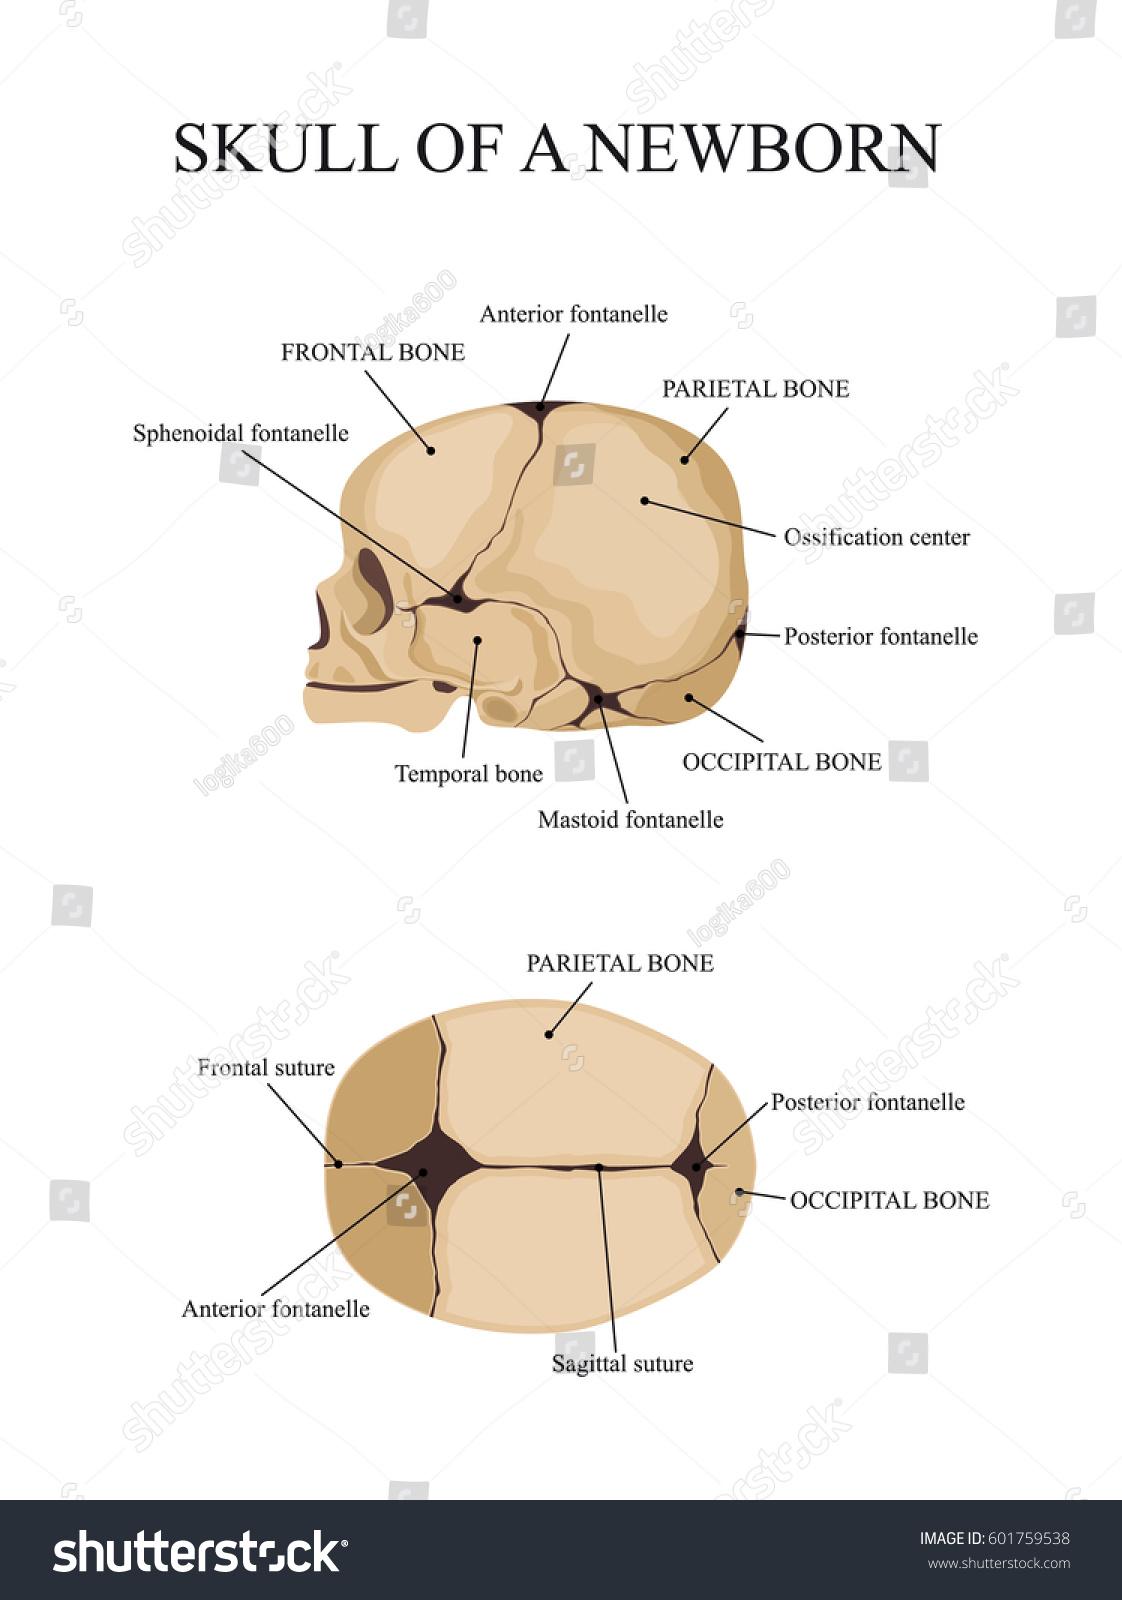 Skull Newborn Human Anatomy Stock Vector Royalty Free 601759538